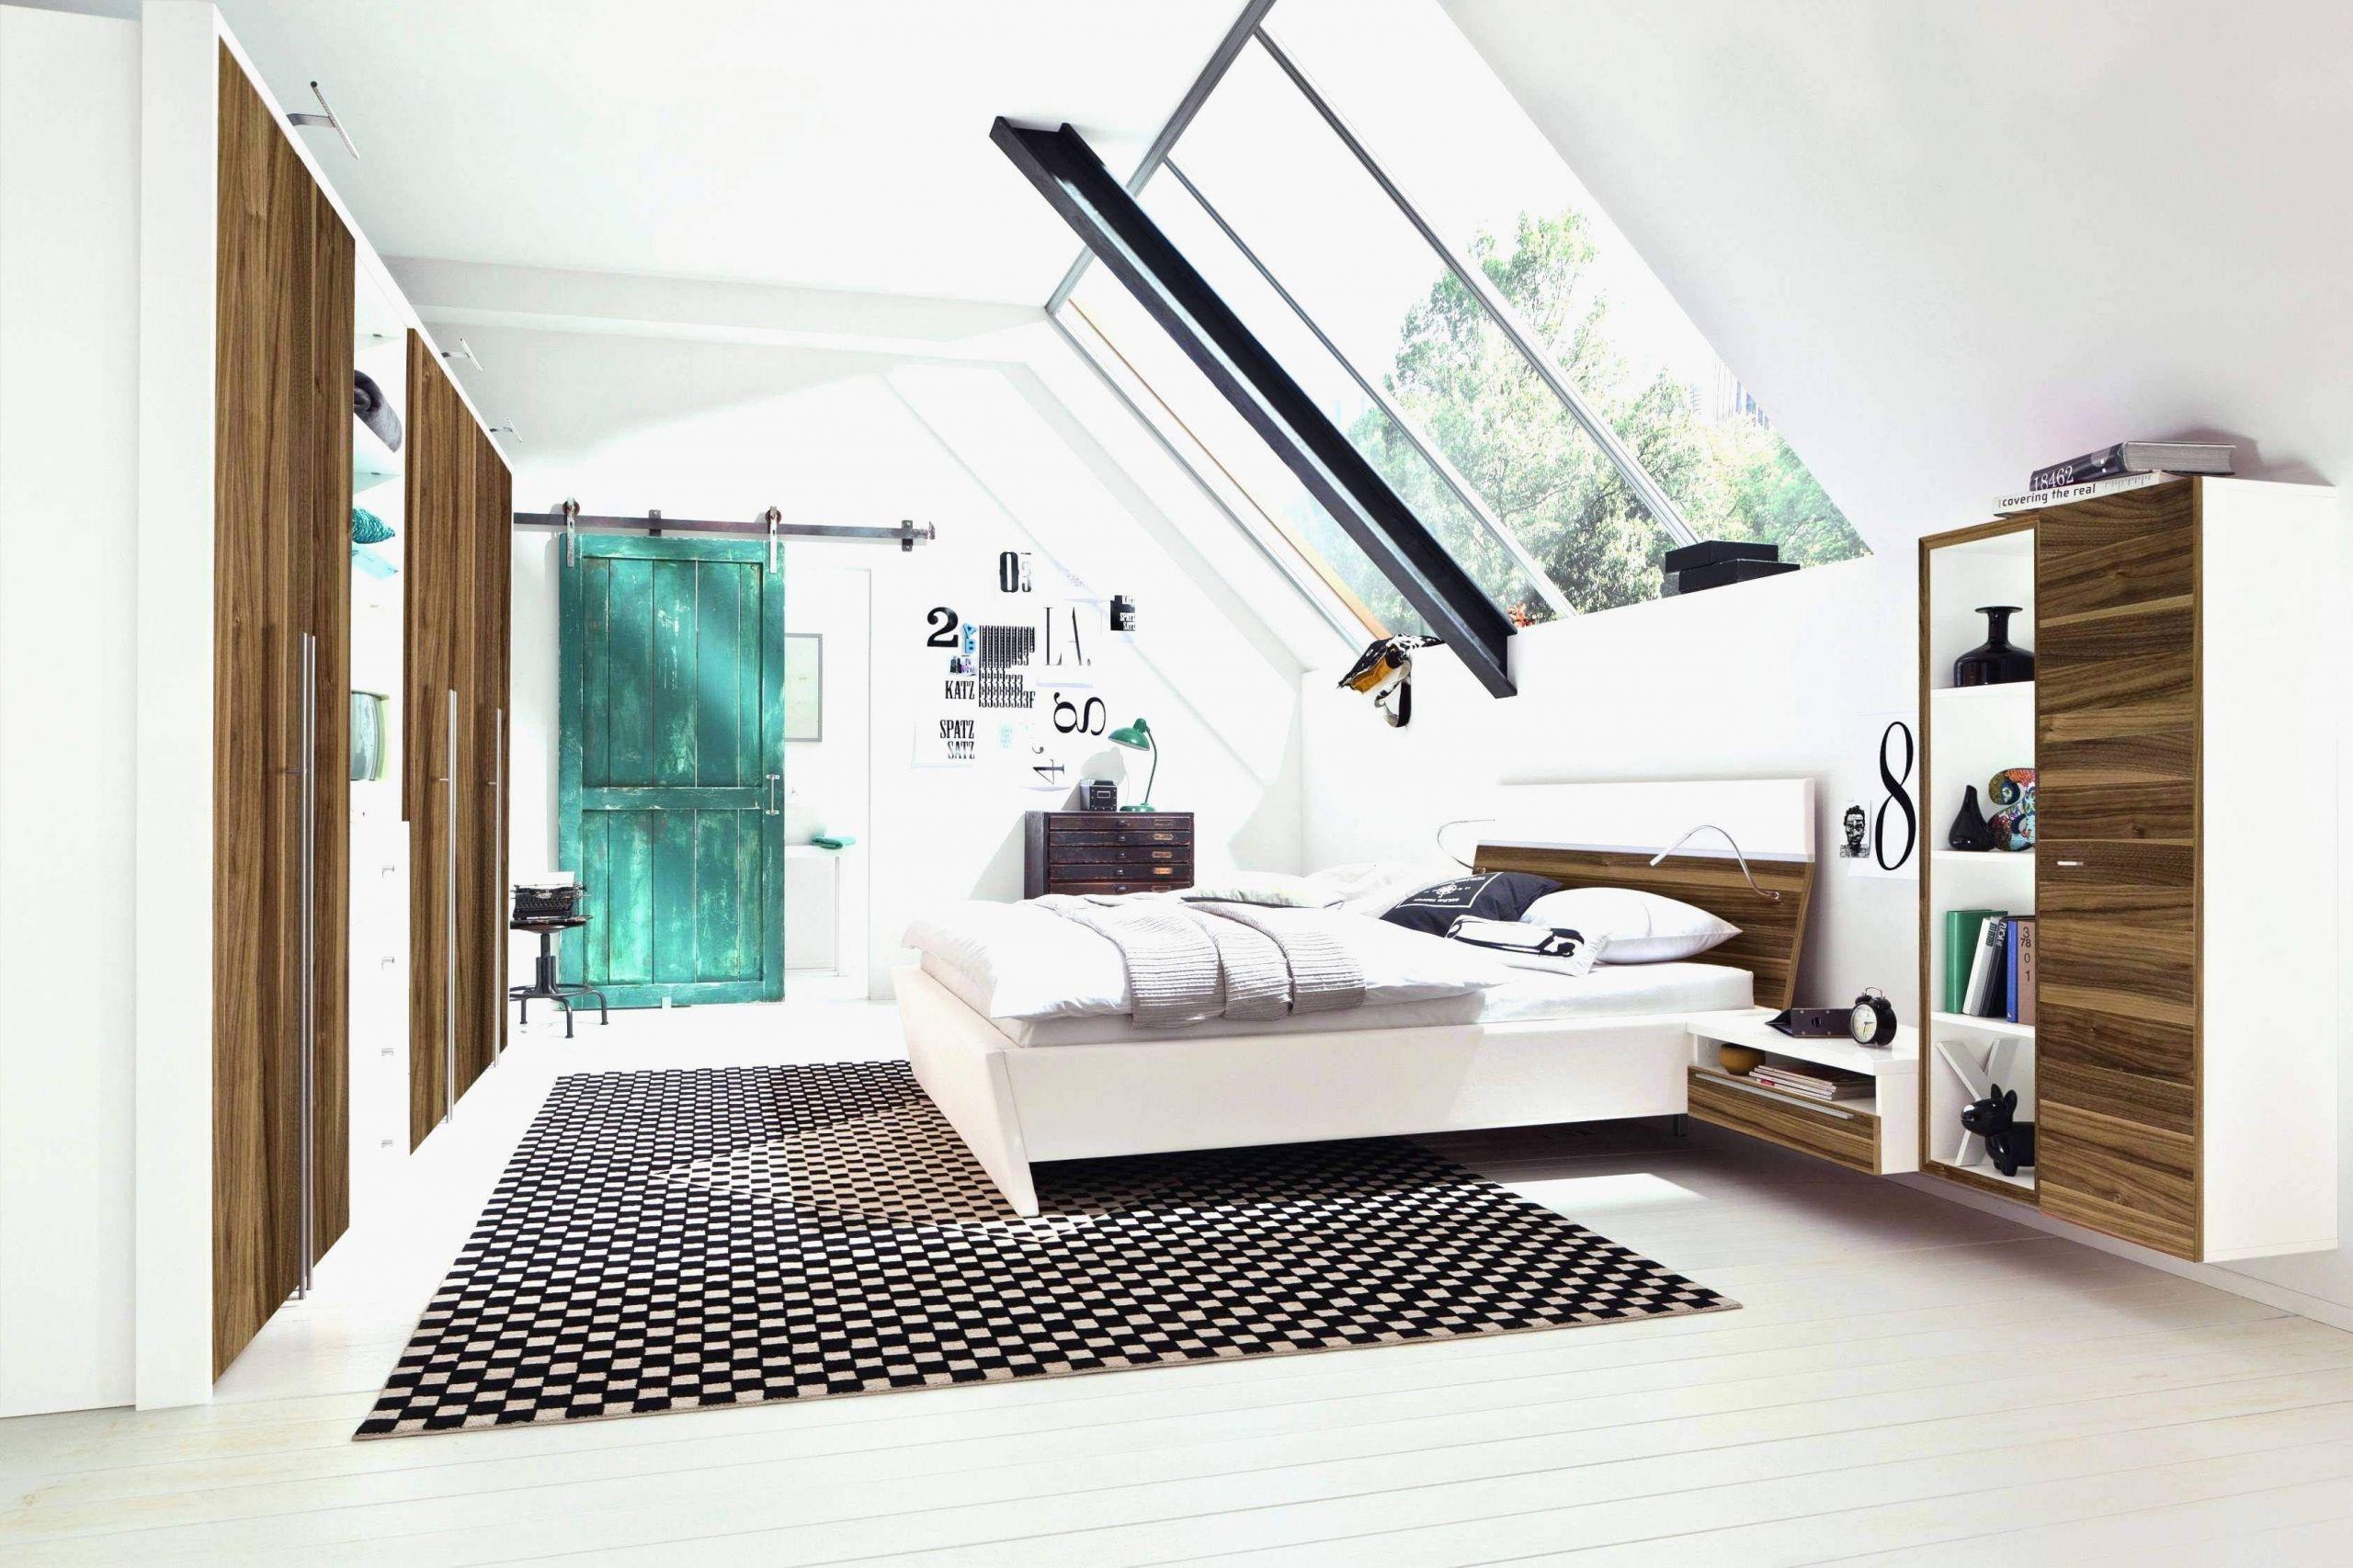 wanddeko wohnzimmer ideen schon wanddeko wohnzimmer luxus elegant dekoideen wohnzimmer ideas of wanddeko wohnzimmer ideen